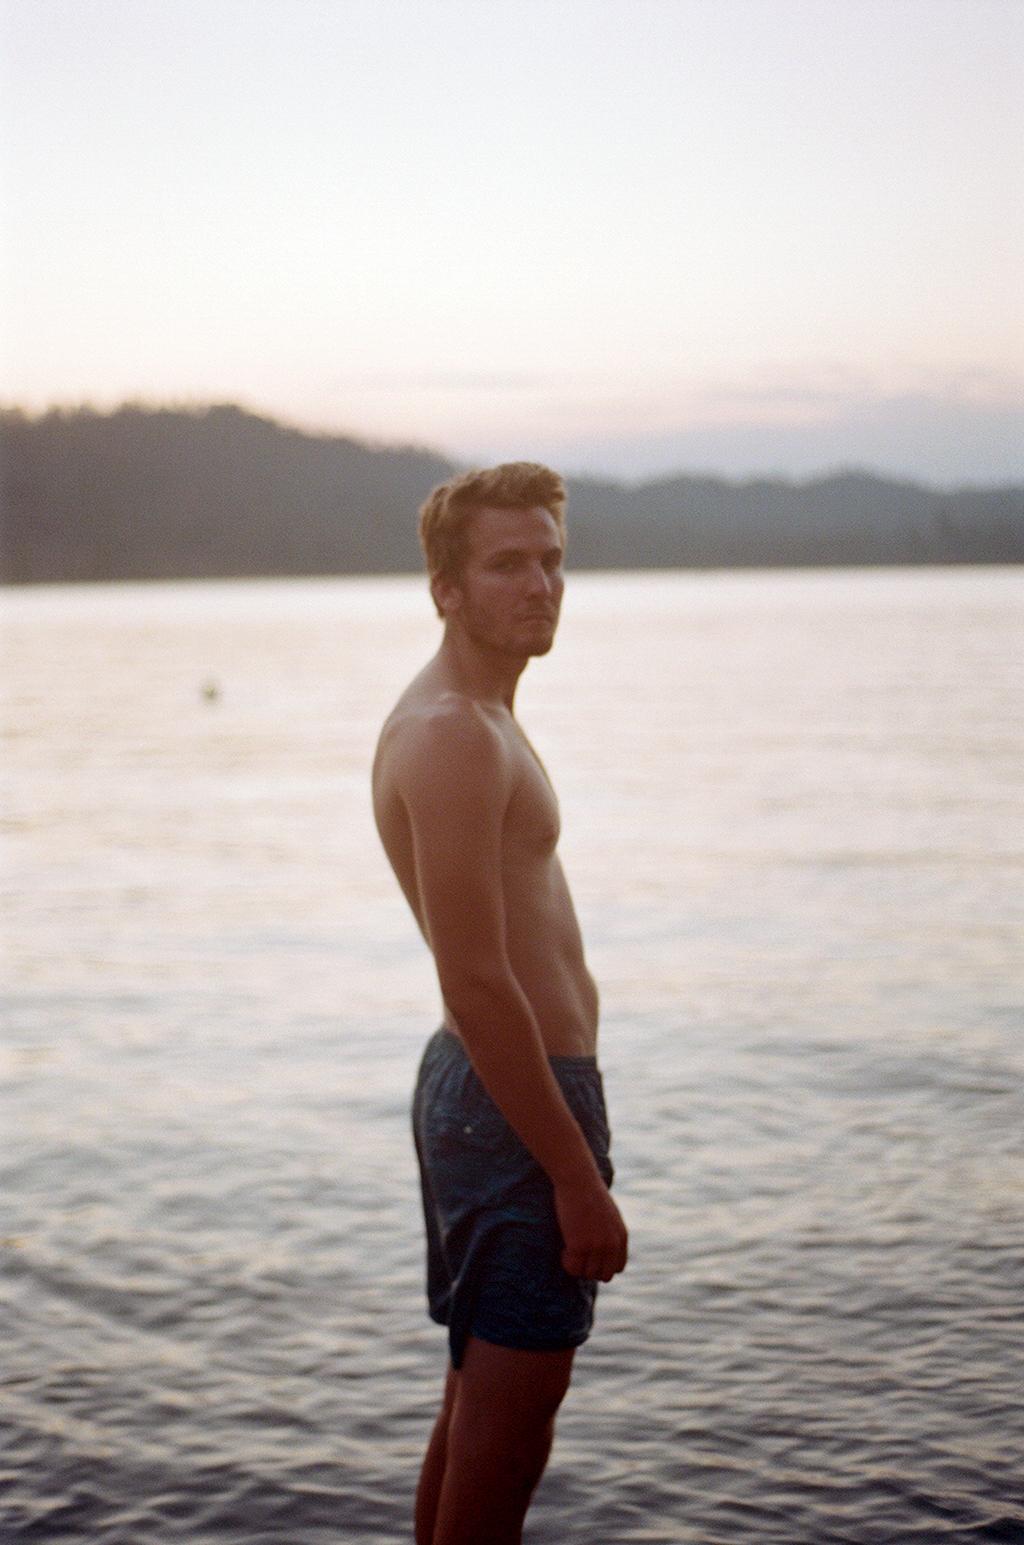 Trent Pederson, 22, Bass Lake, CA.